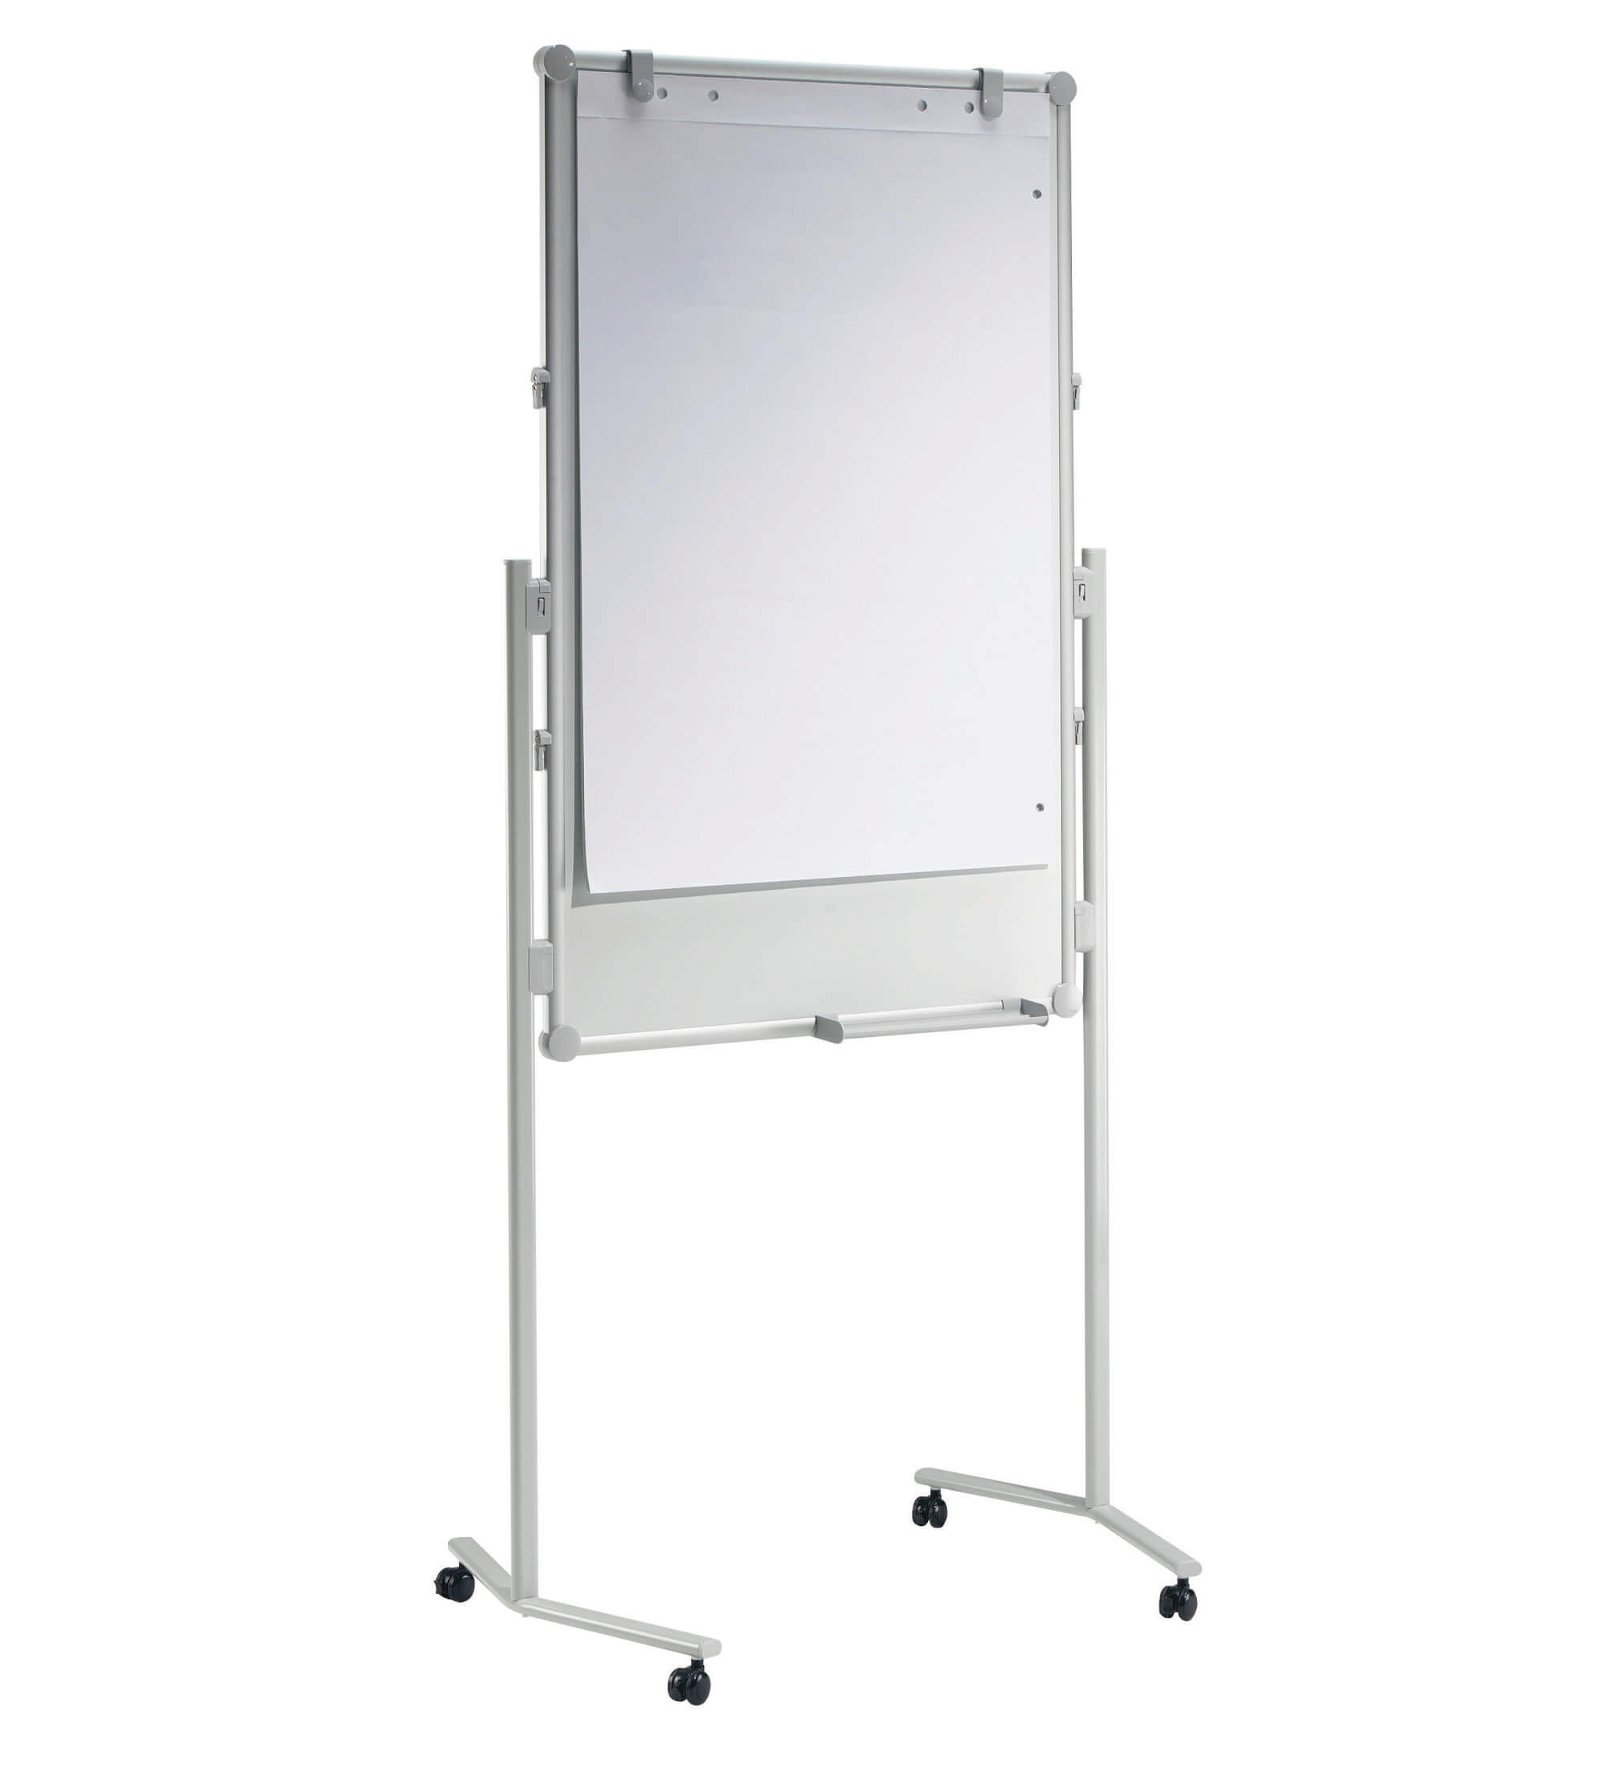 Moderationstafel MAULpro Textil/WB, 120x75 cm, grau